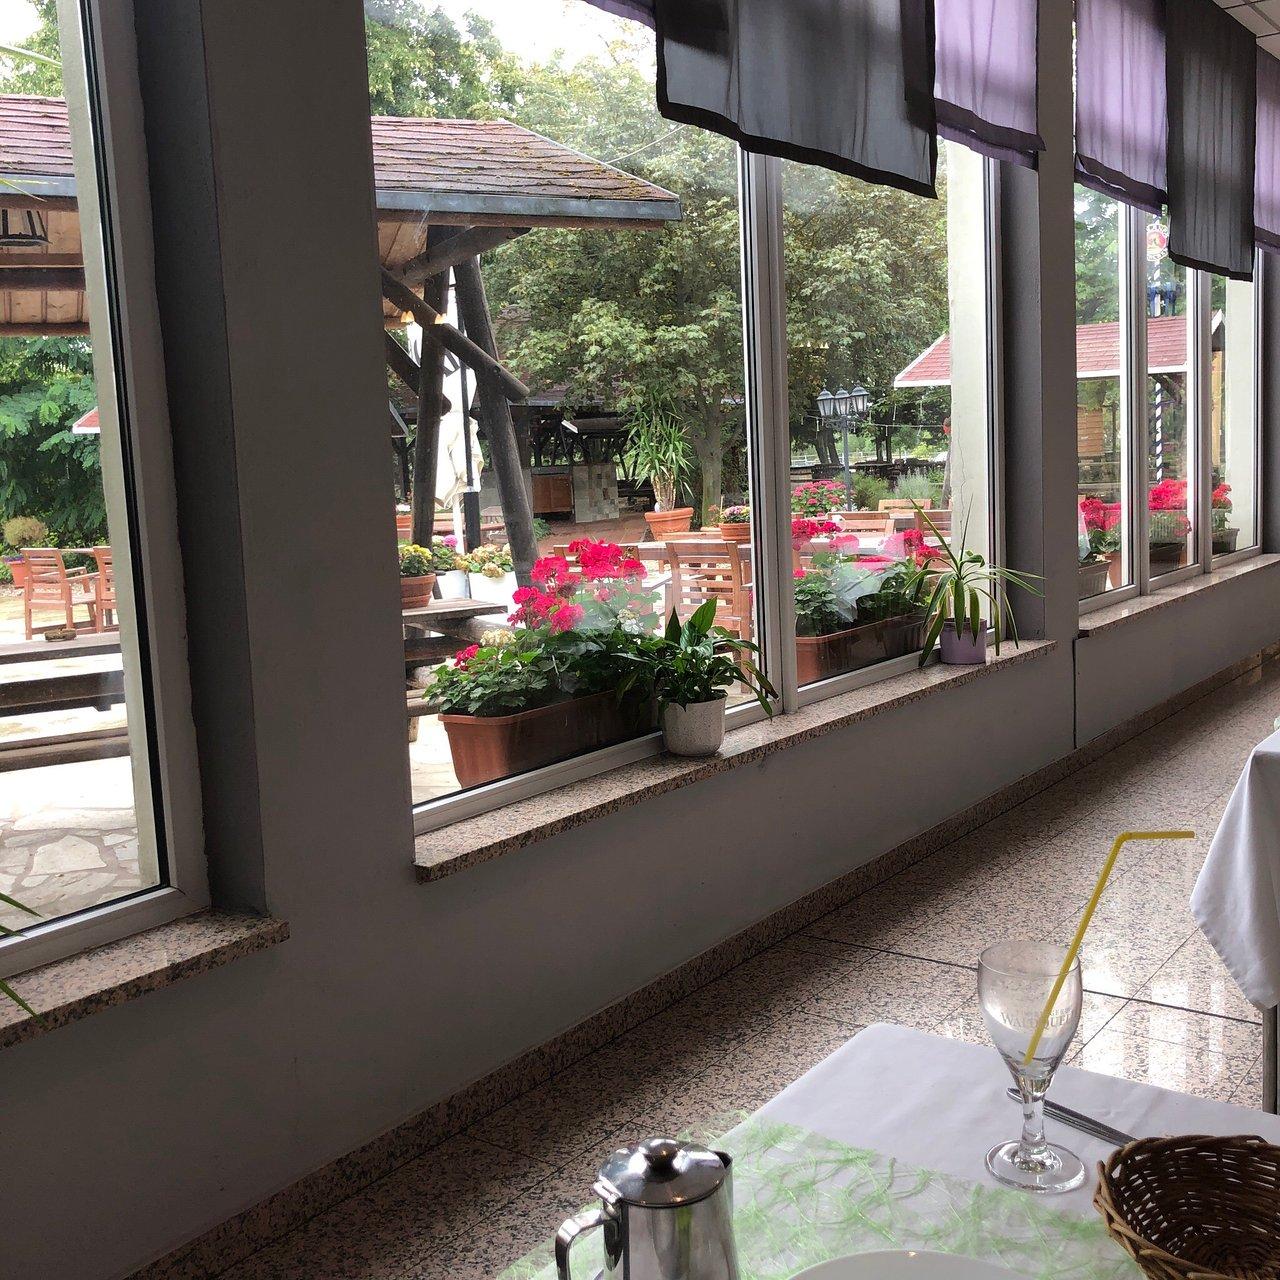 Hotel Schoene Aussicht 88 9 3 Prices Reviews Leissling